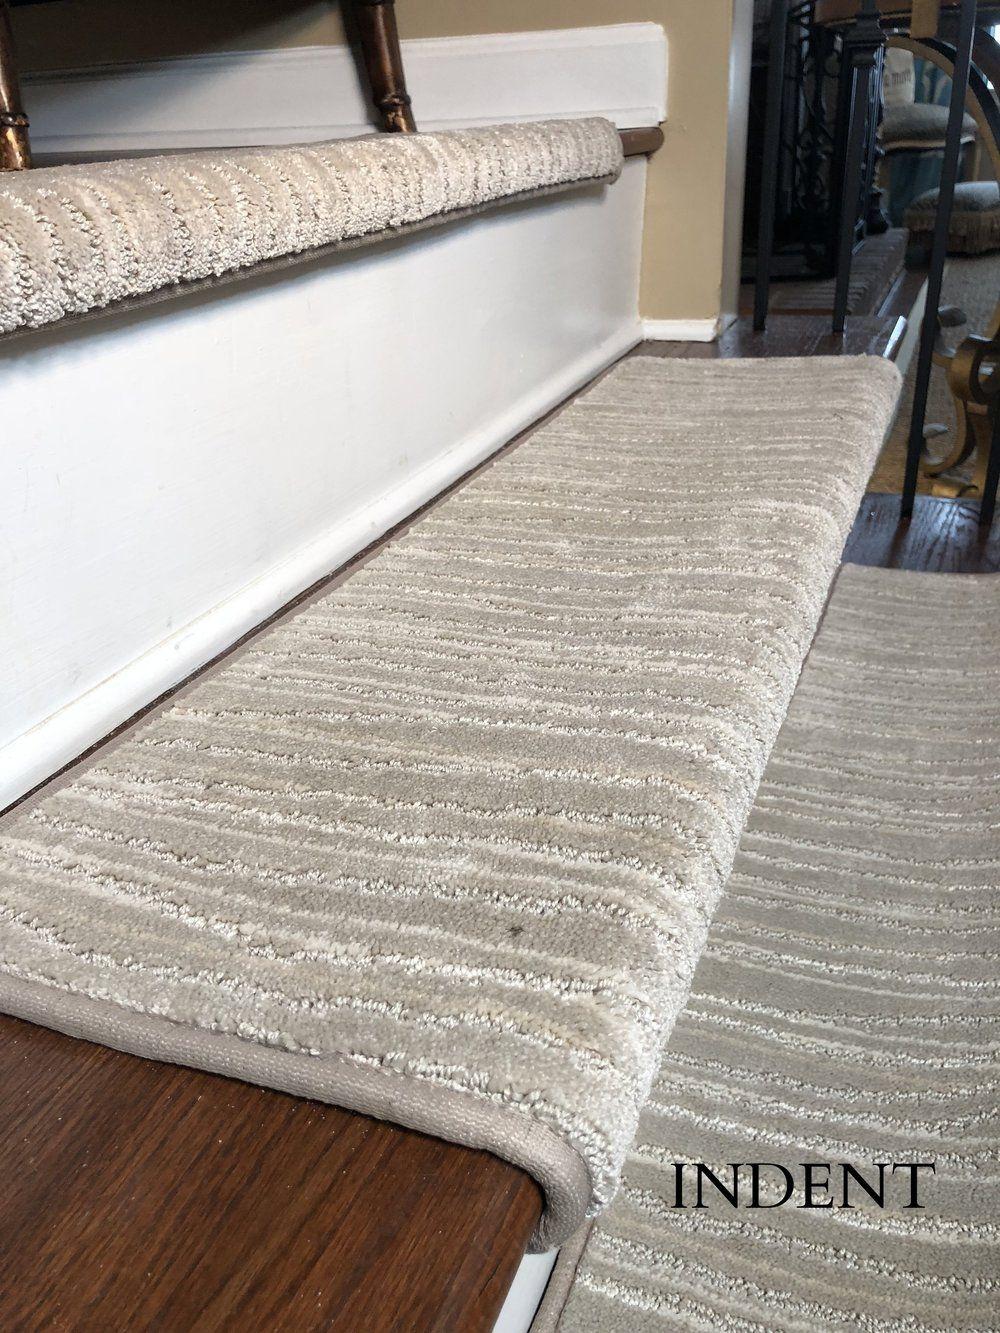 Linea Types of carpet, Cheap carpet runners, Carpet design